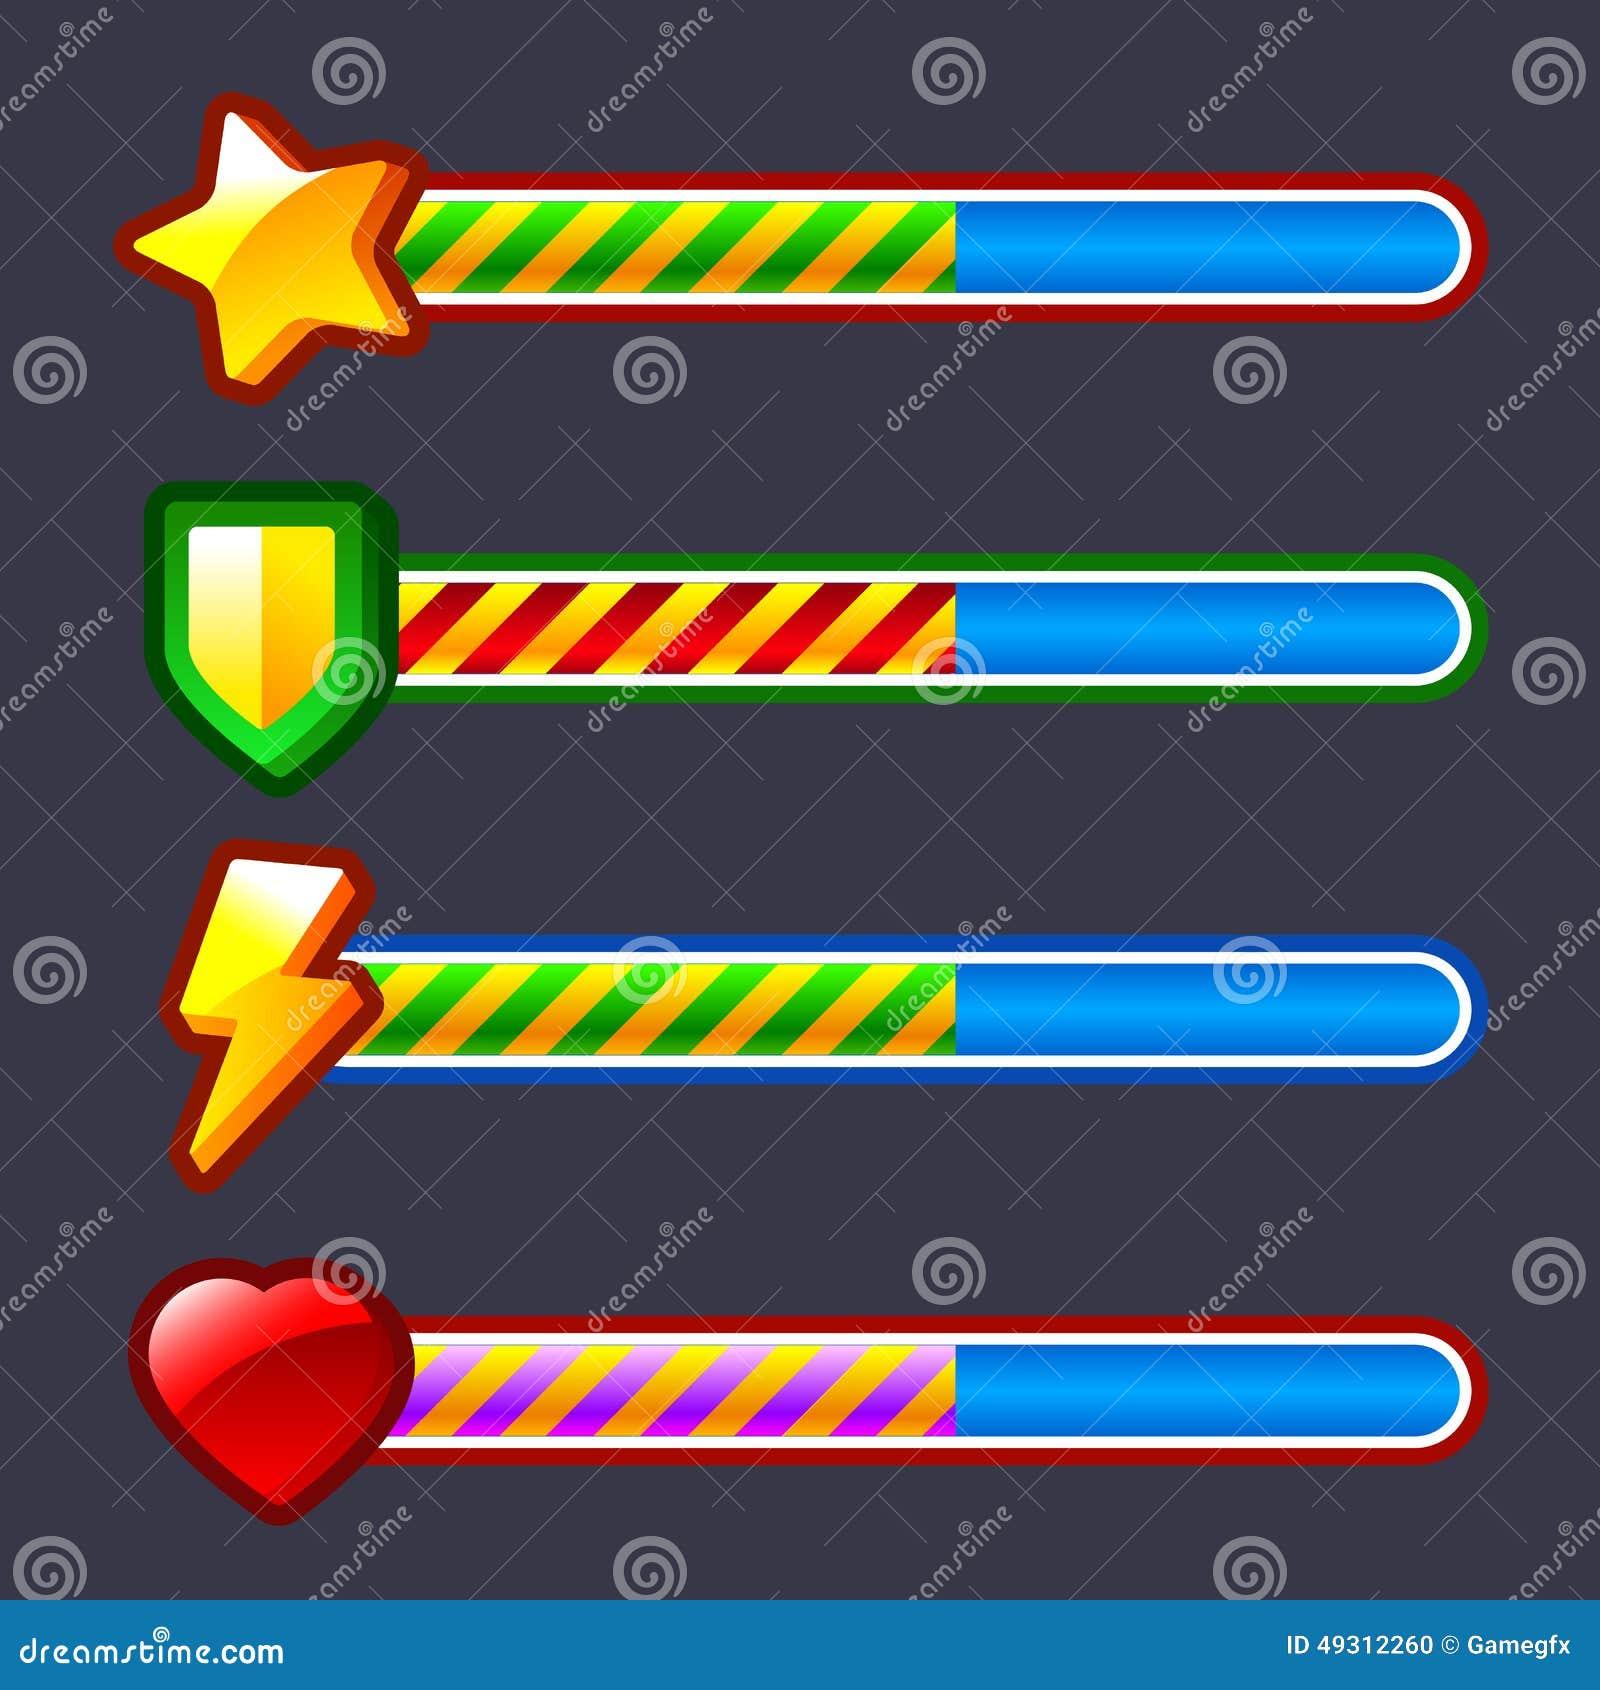 Energy Progress Loading Game Bar Set Stock Vector Image